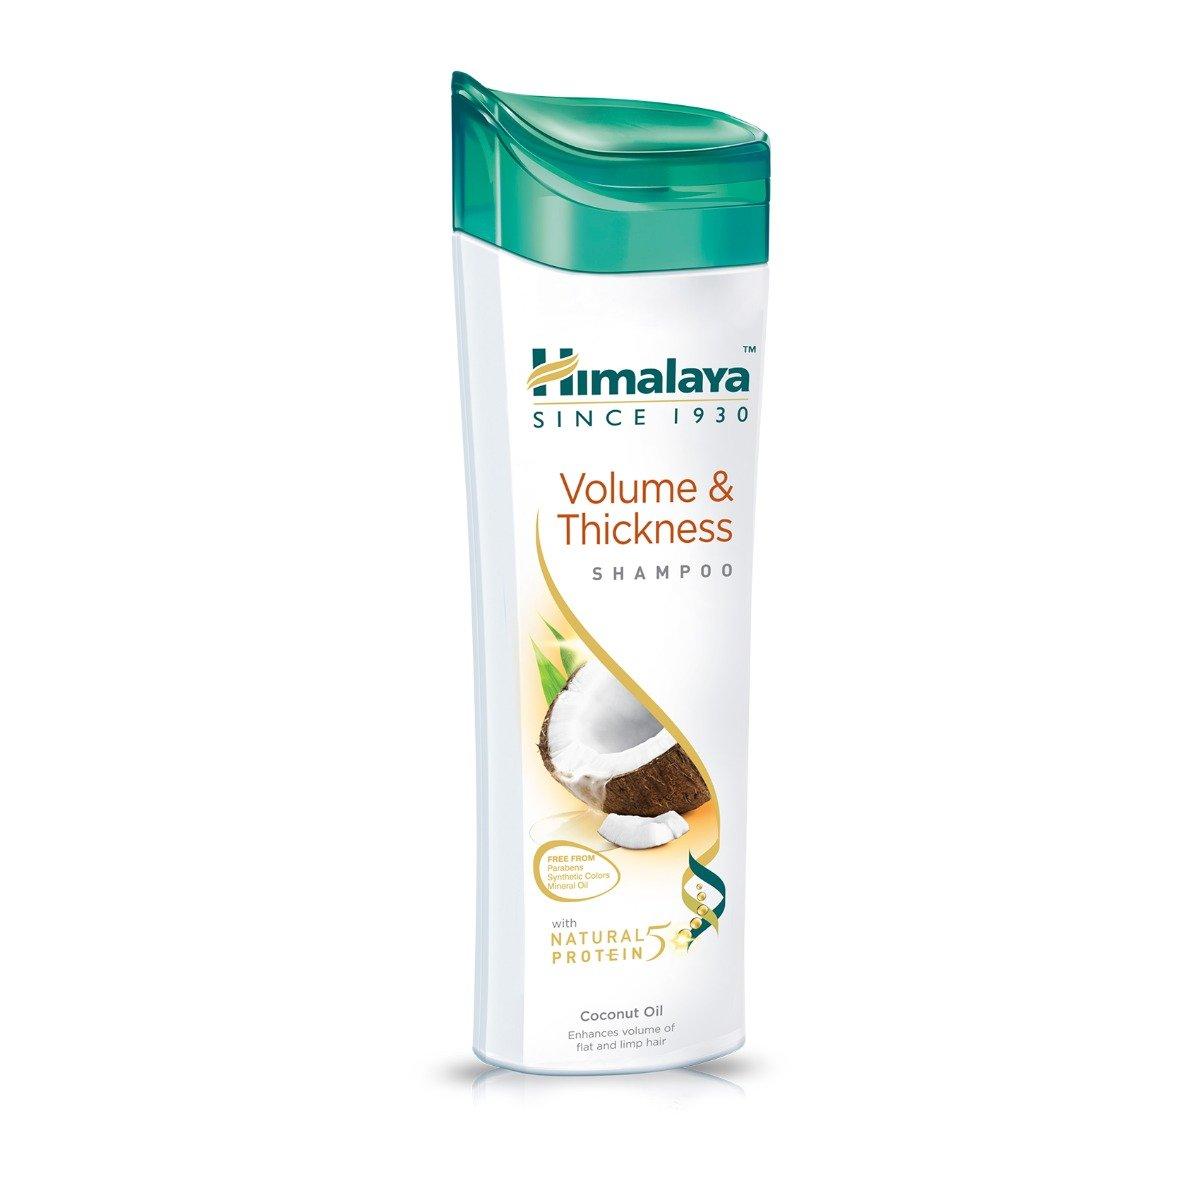 Sampon Himalaya Volume & Thickness, 200 ml imagine